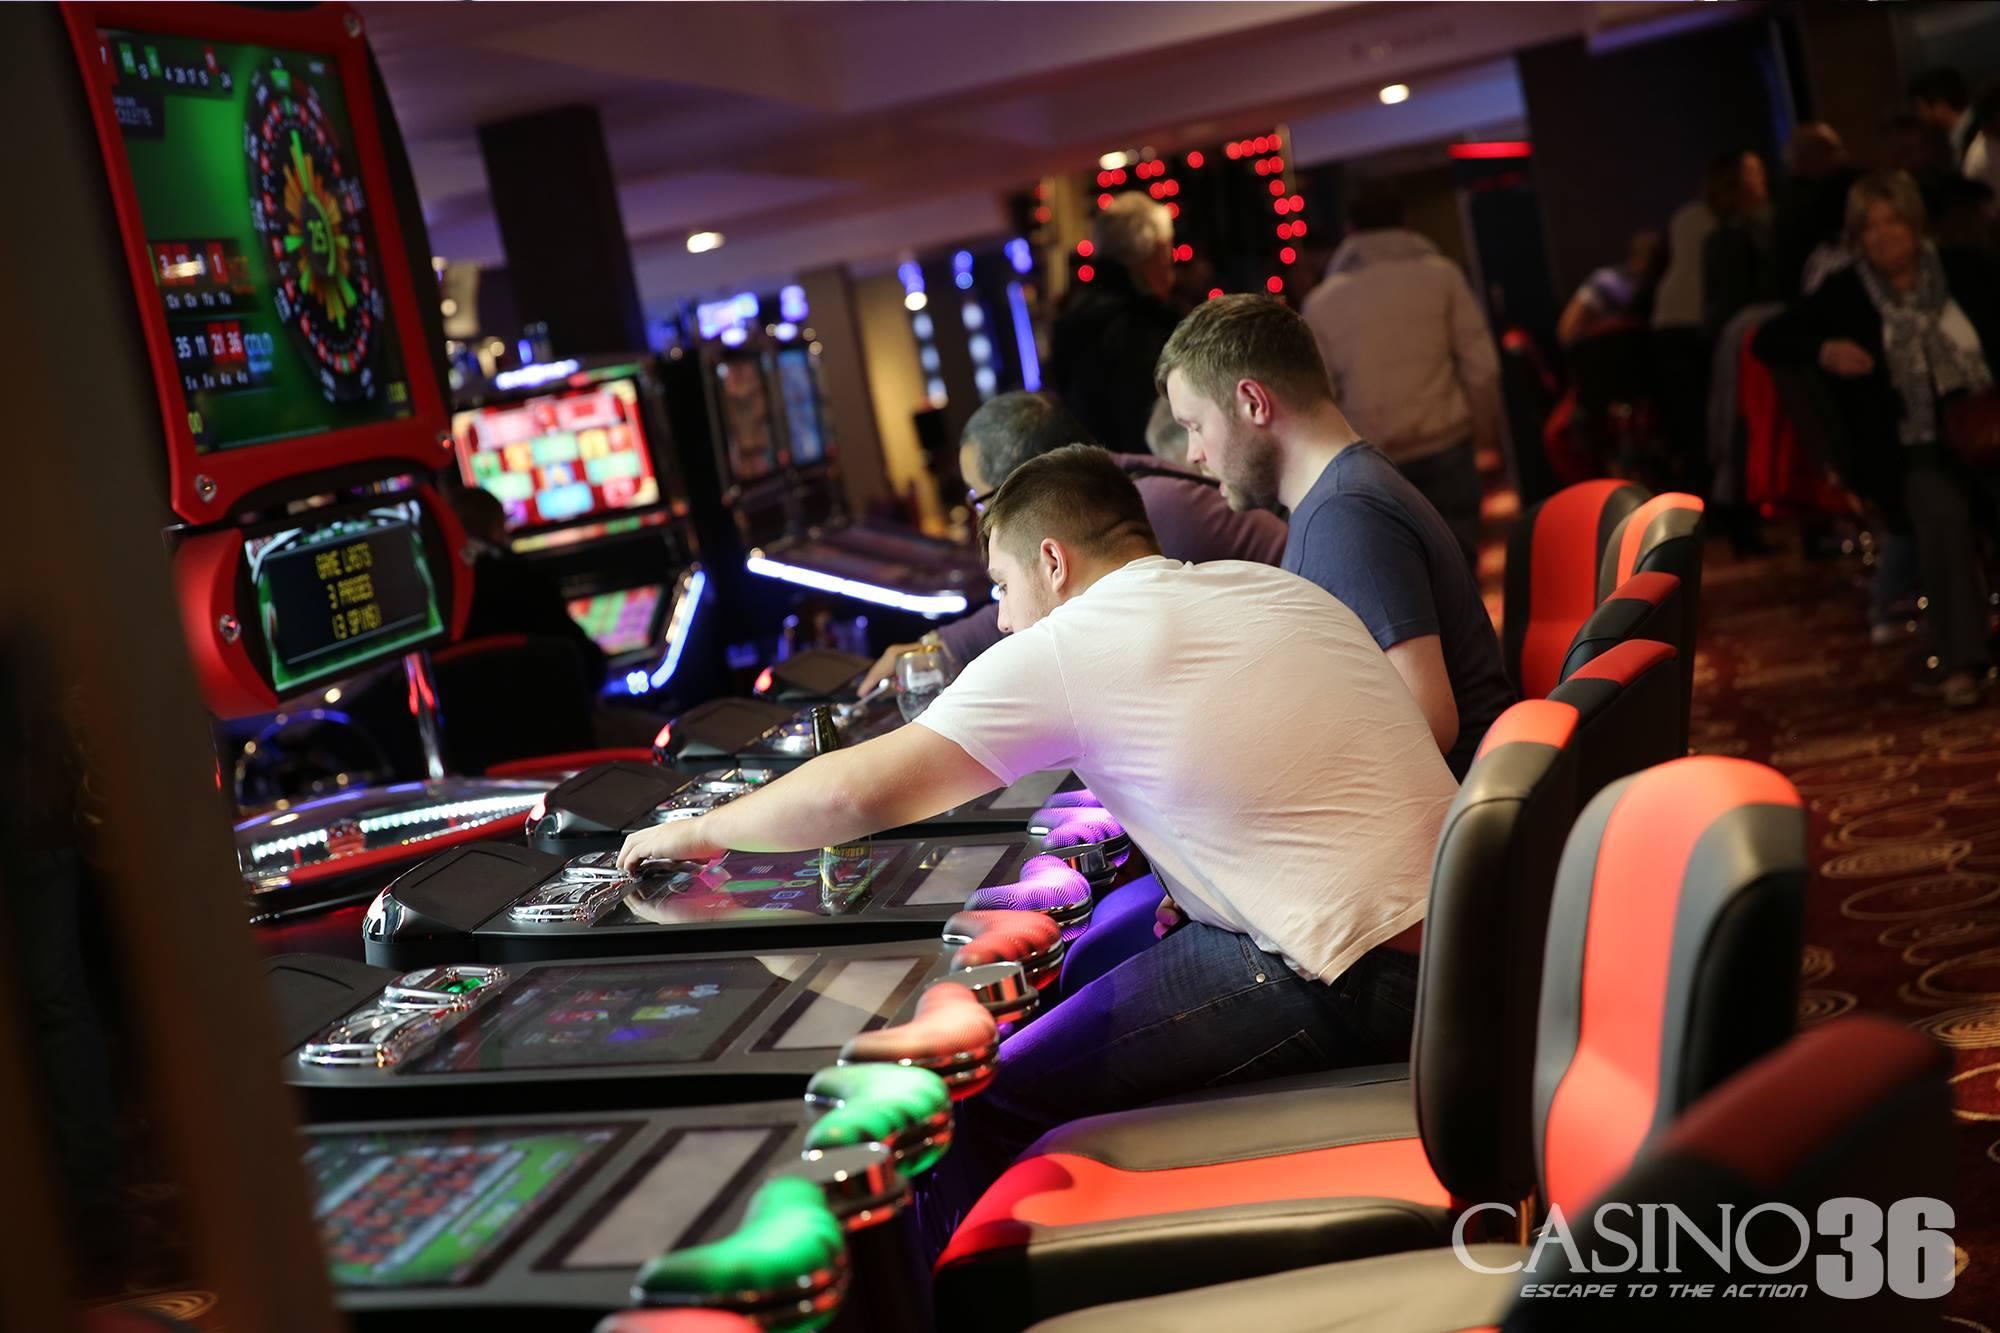 Casino 36 Wolverhampton Opens